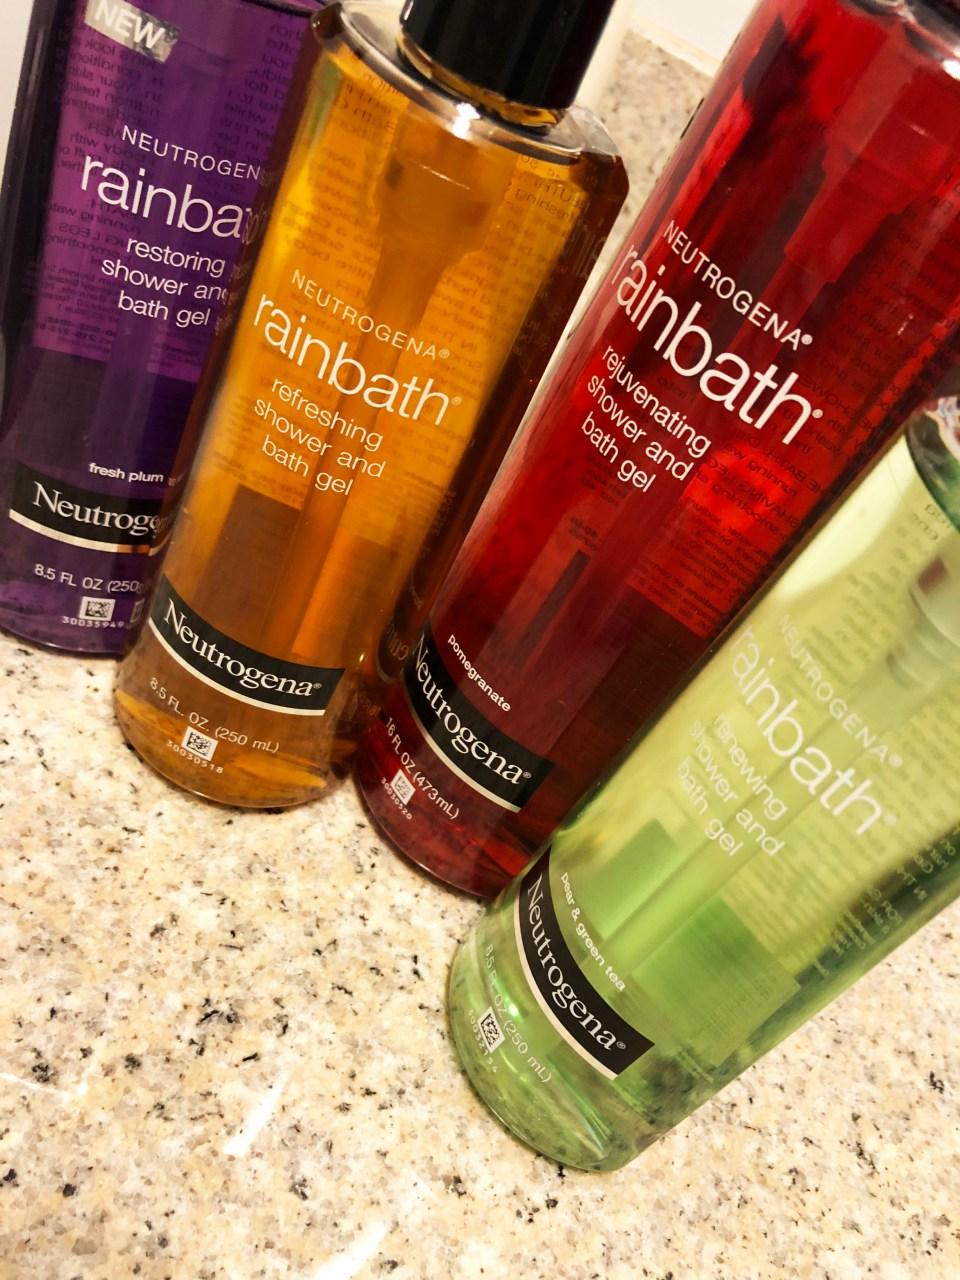 Neutrogena Rainbath Shower & Bath Gel 1